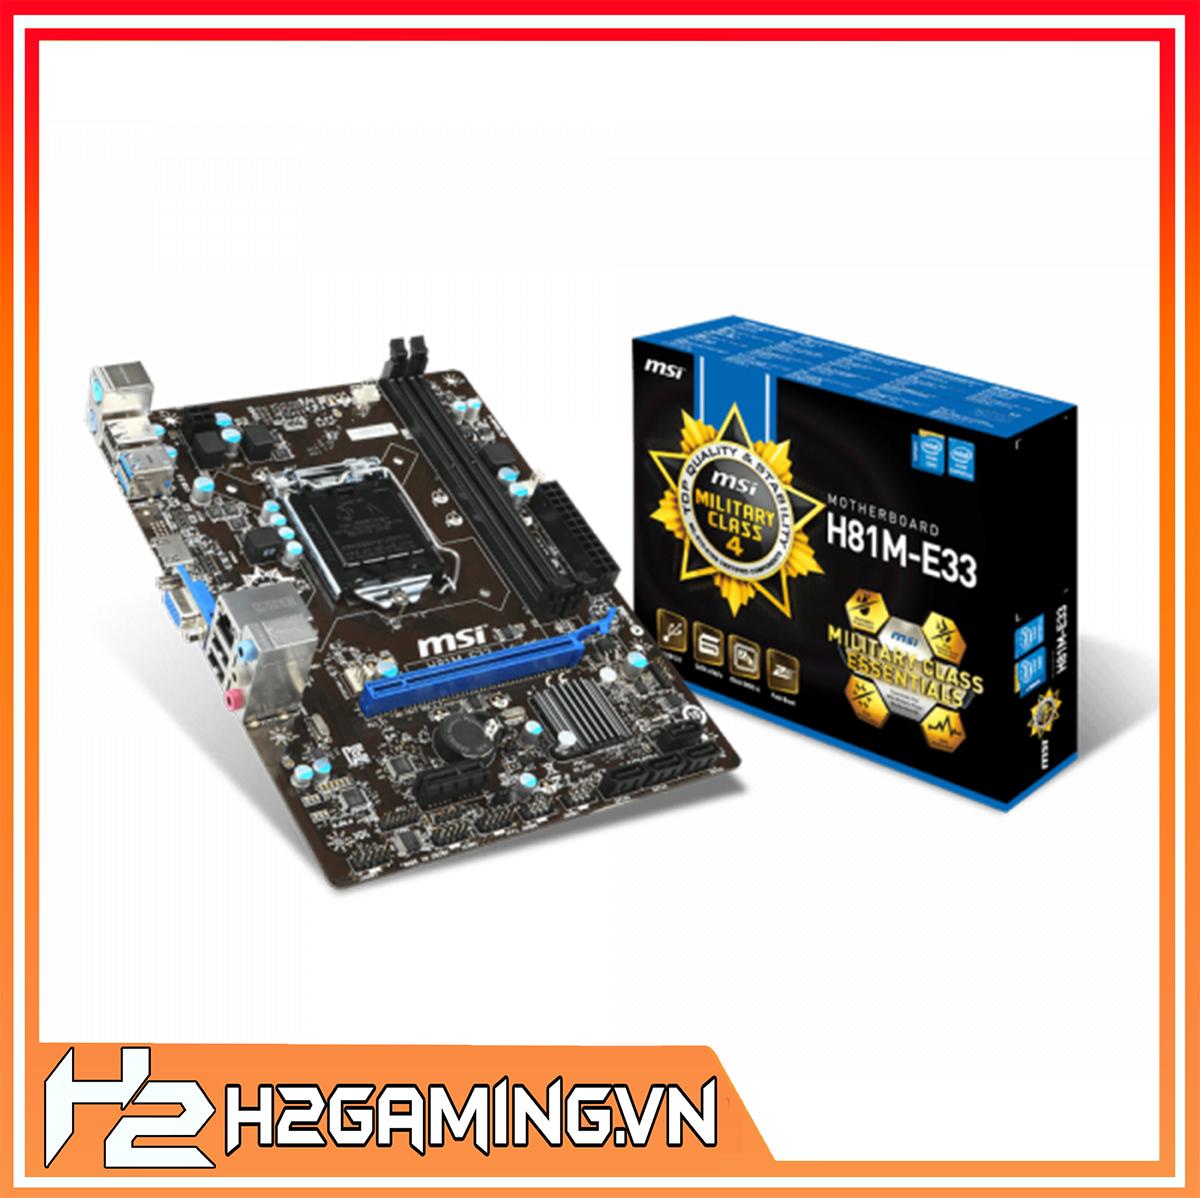 Mainboard_MSI_H81M-E33